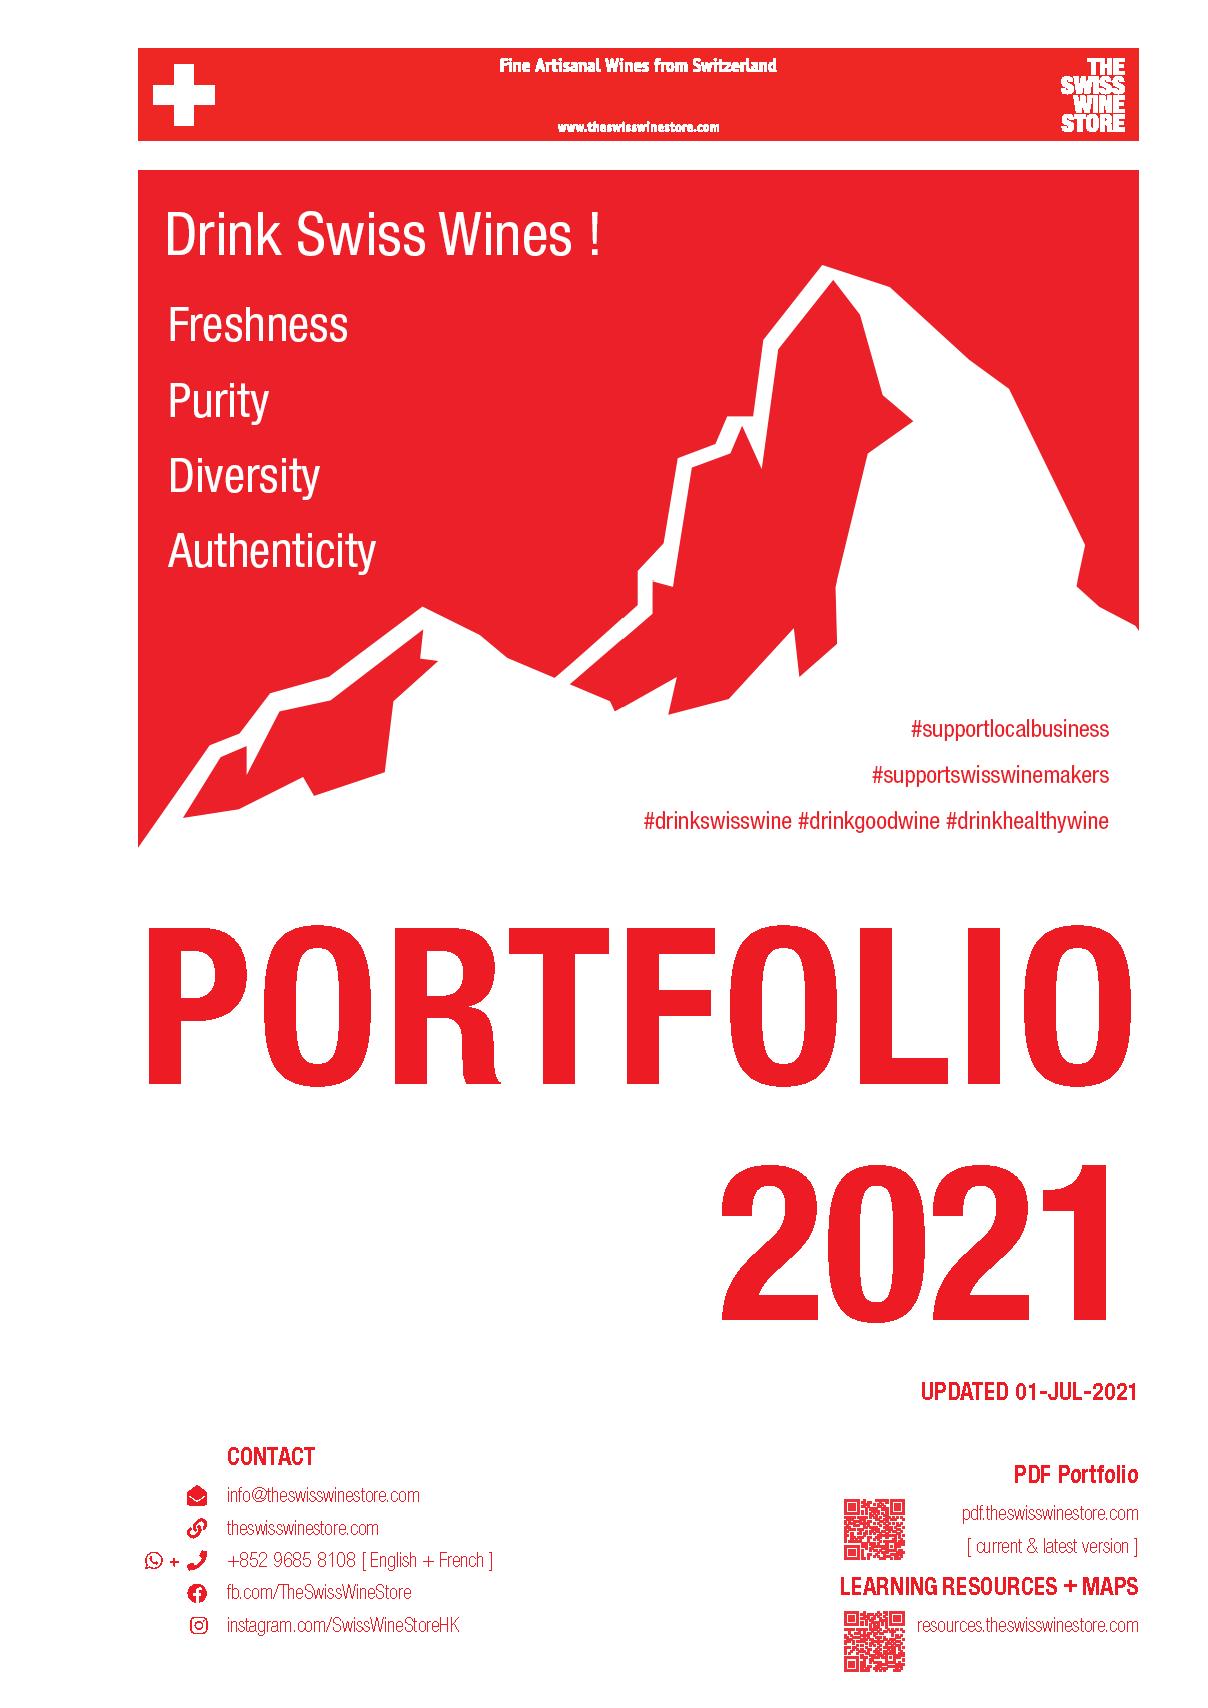 tsws_wine_portfolio_A4_2021-06.png